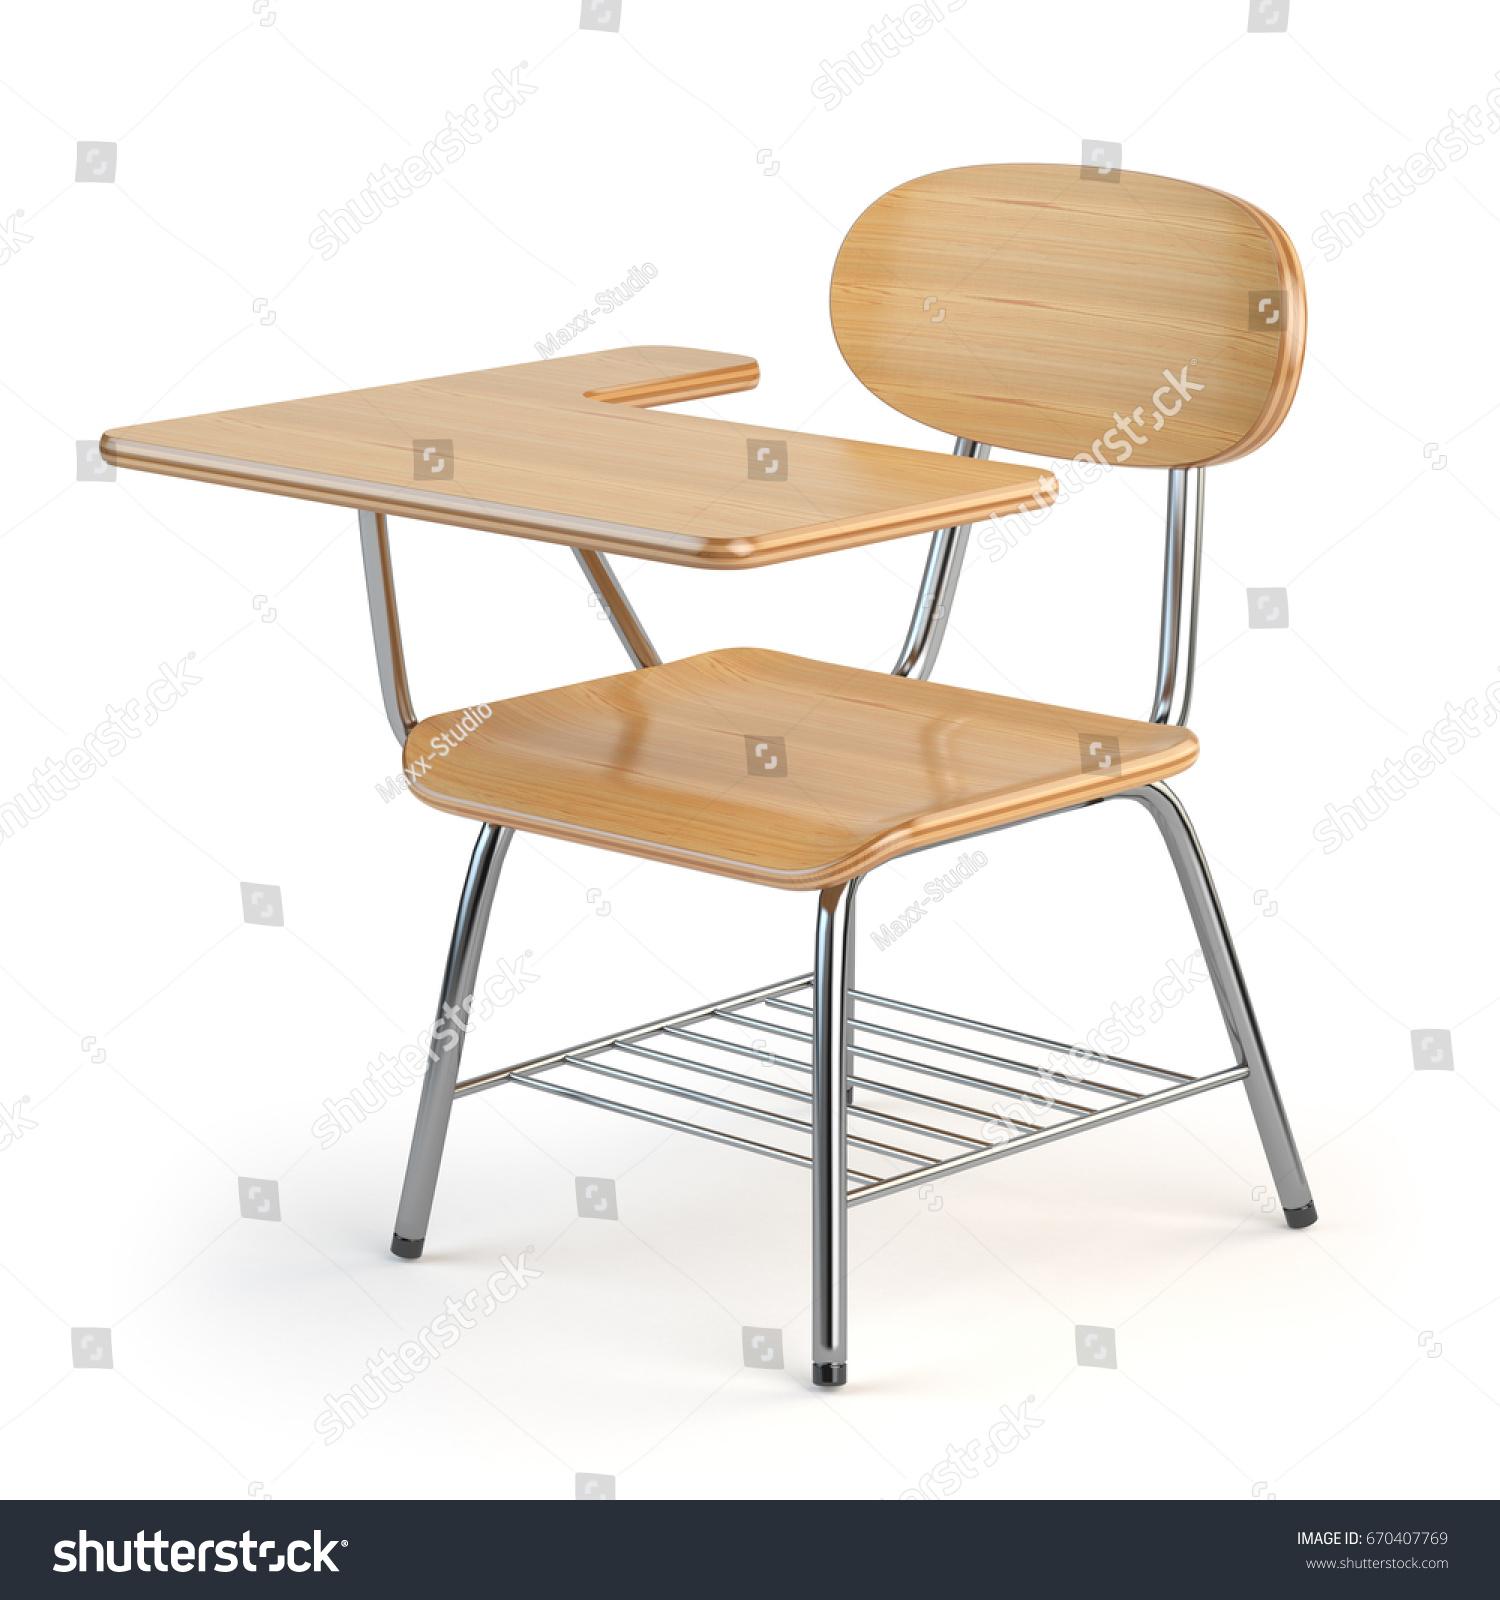 Wooden School Desk Chair Isolated Stock Illustration